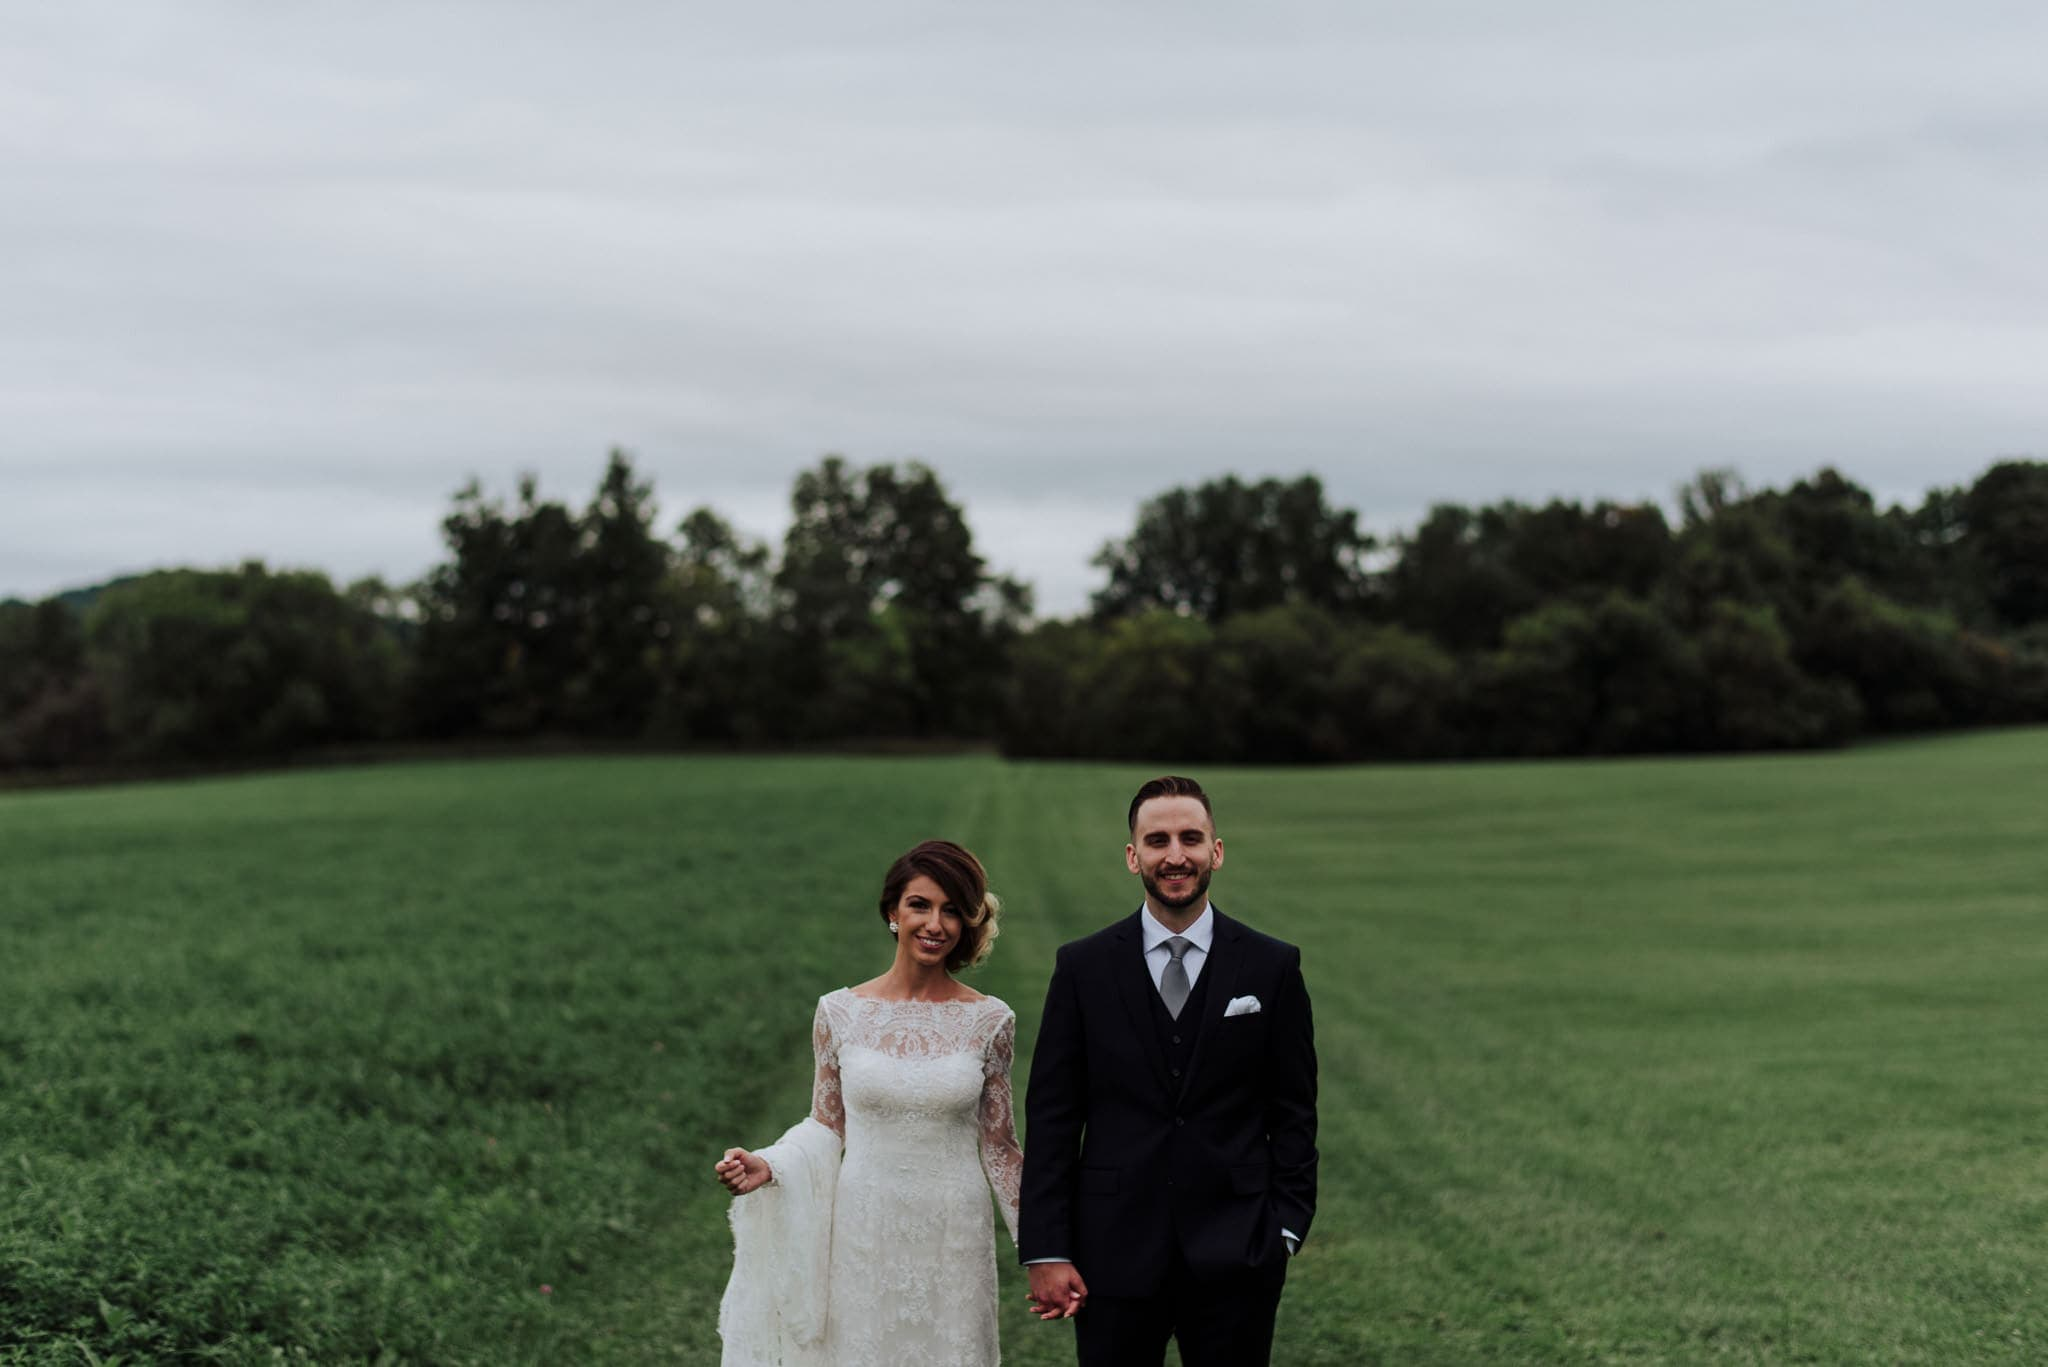 hayloft-on-the-arch-wedding-29